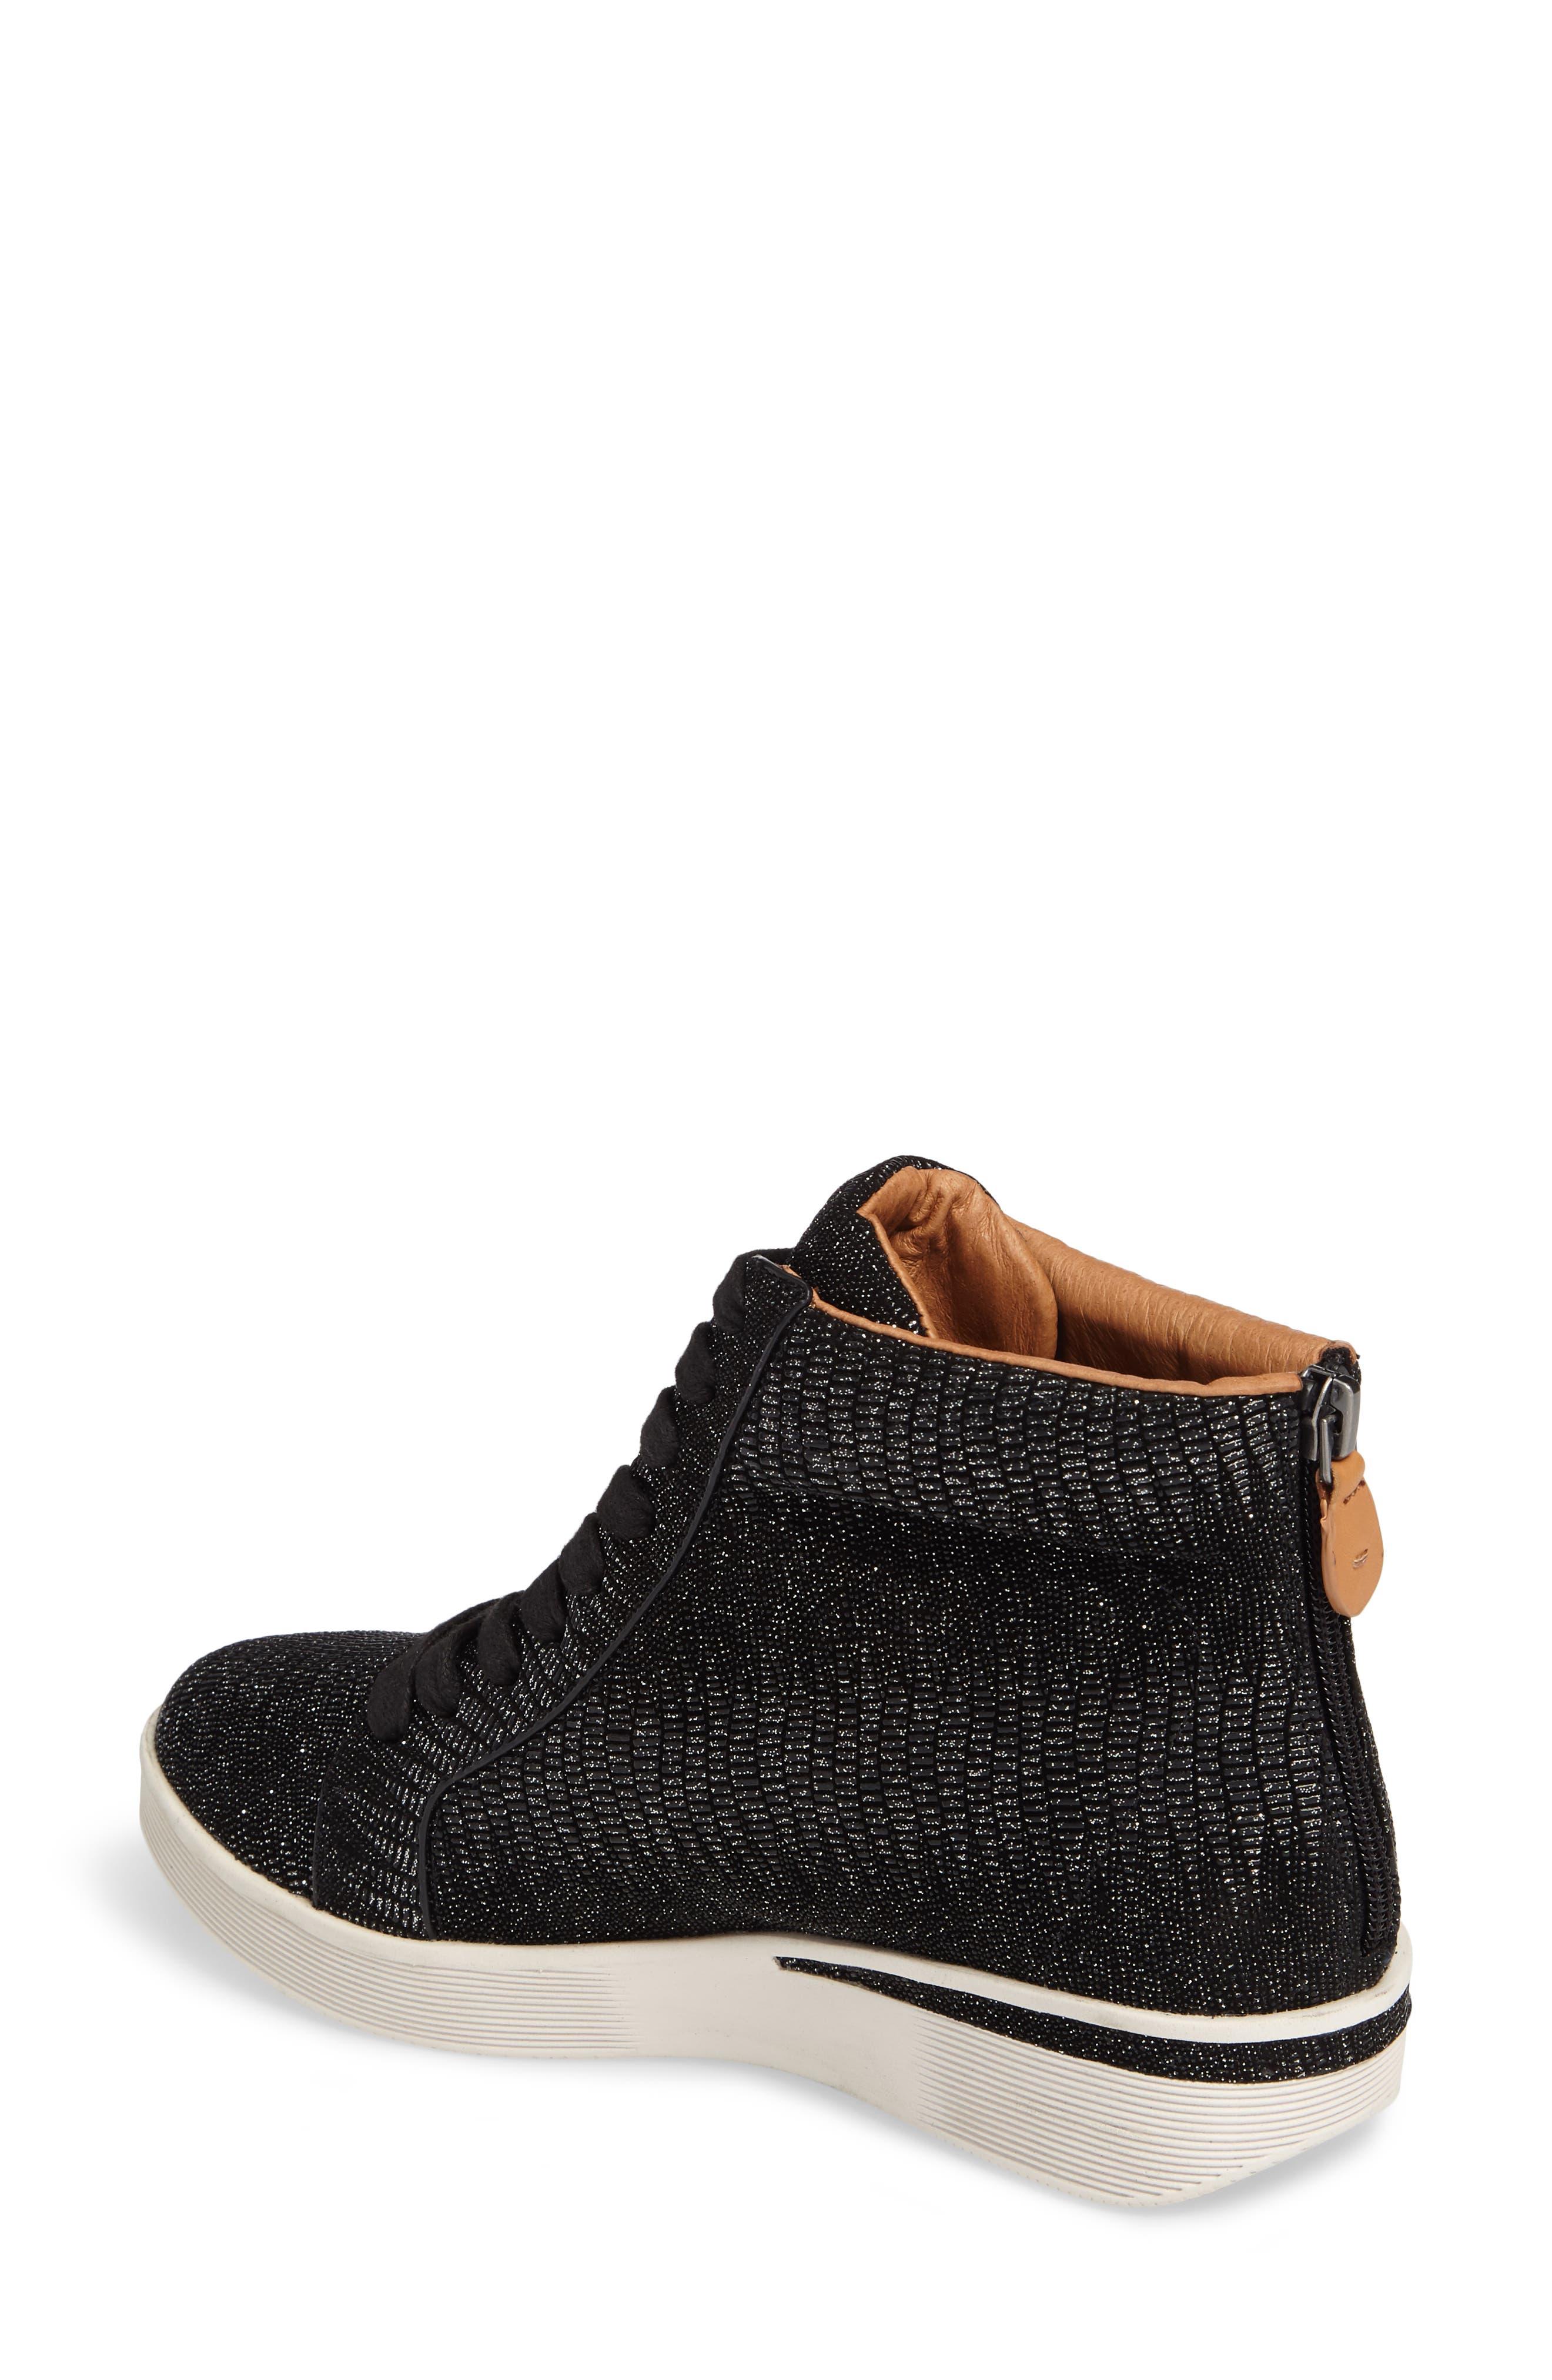 Helka High Top Sneaker,                             Alternate thumbnail 2, color,                             001